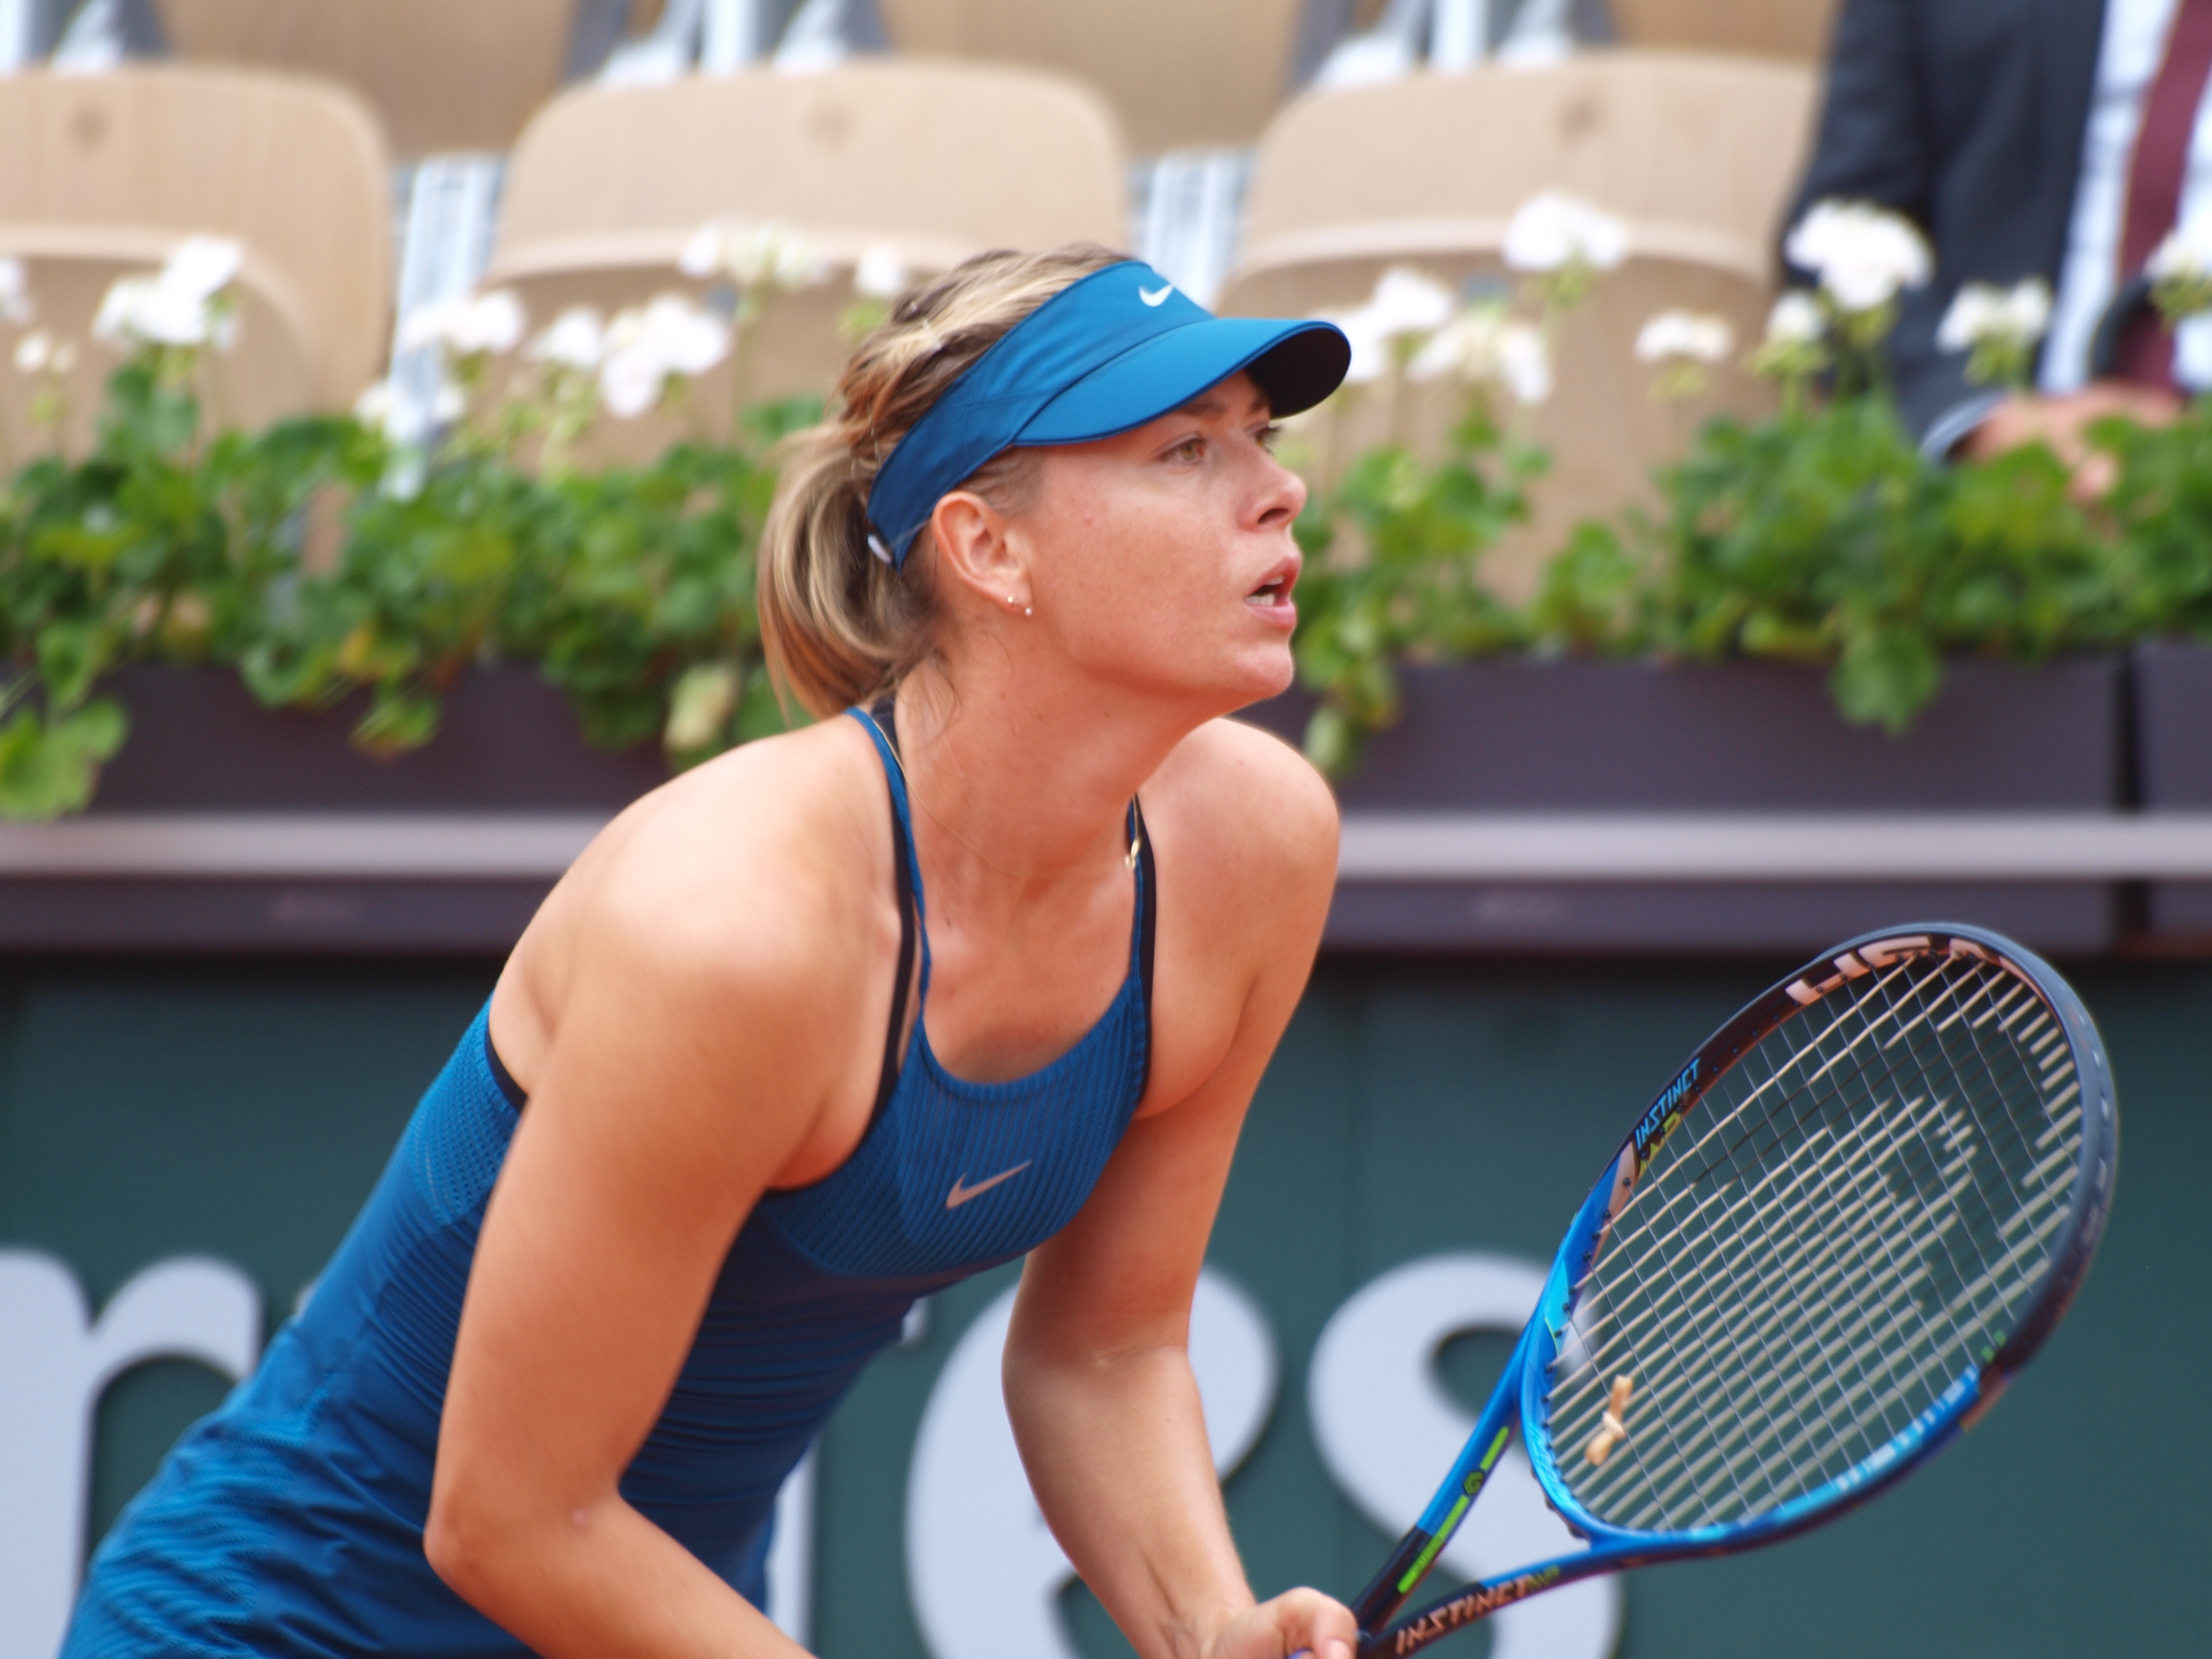 Мария Шарапова / Maria Sharapova, US Open 2018